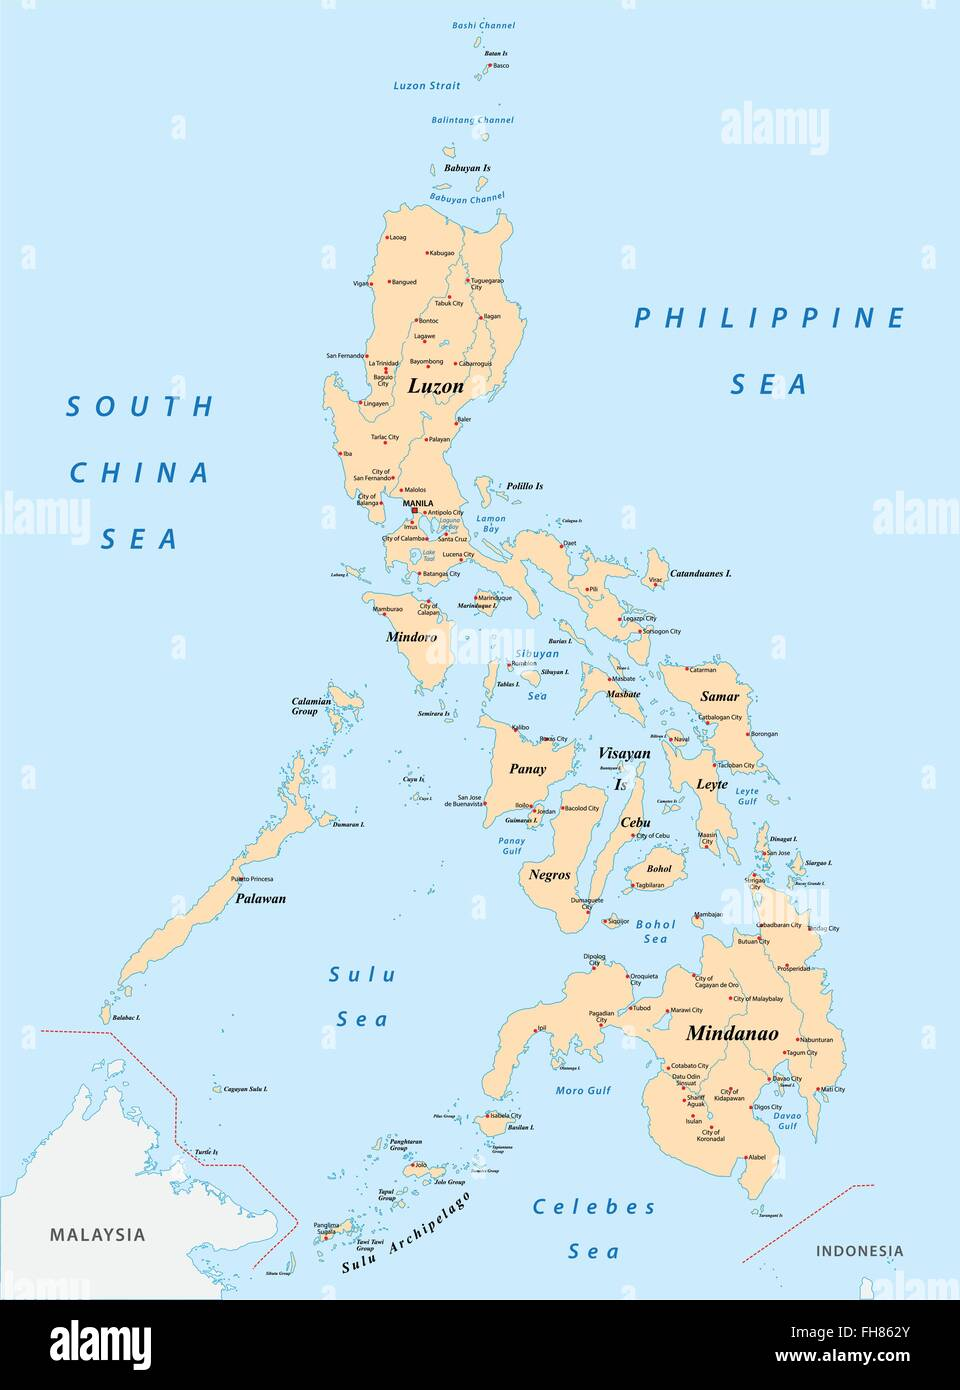 Philippines map - Stock Image